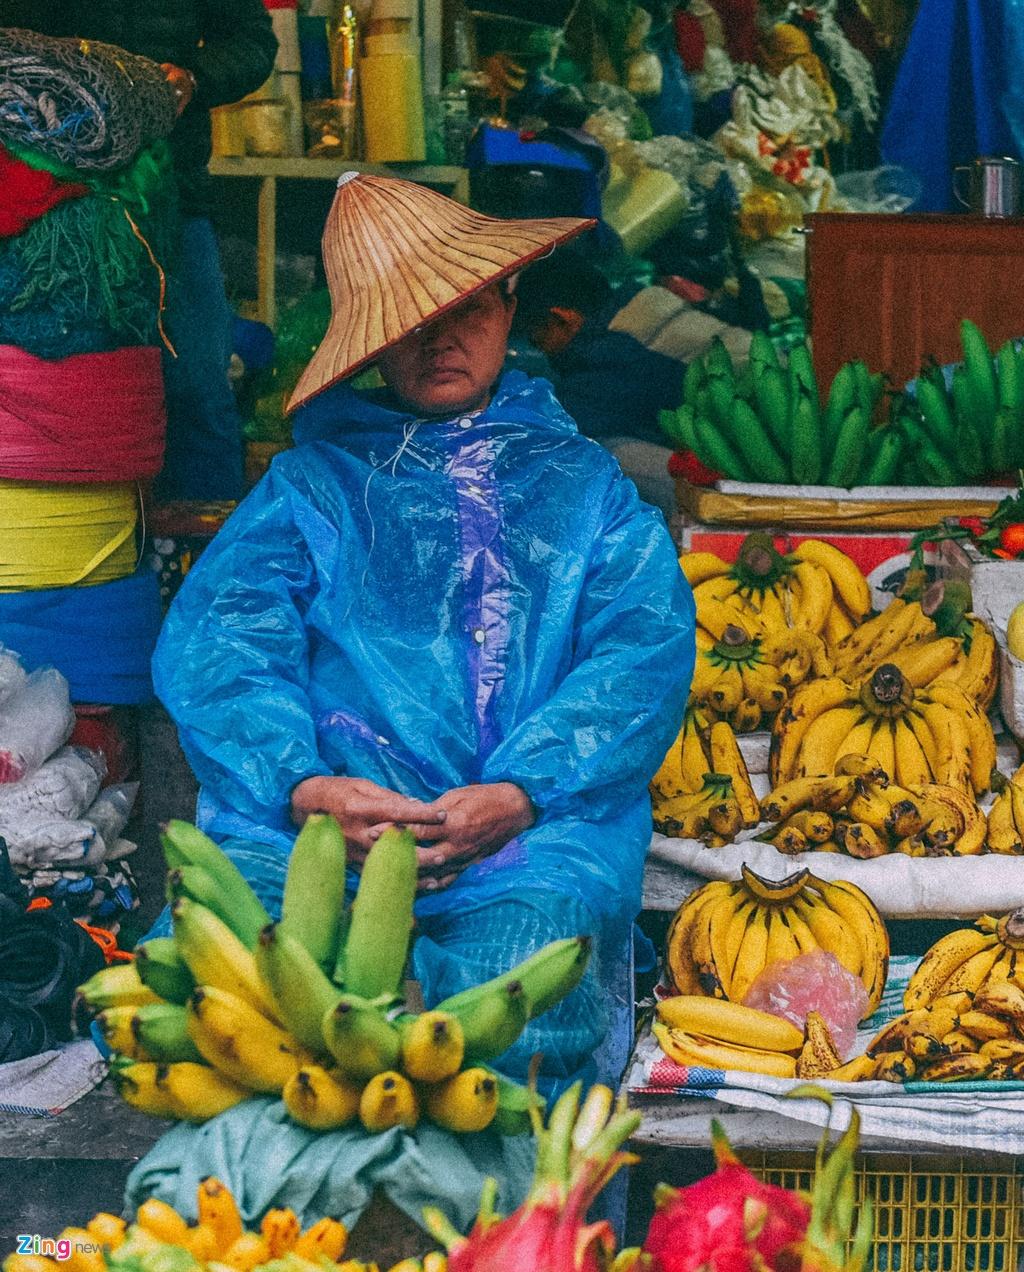 Nhung canh doi muu sinh trong mua lanh hinh anh 19